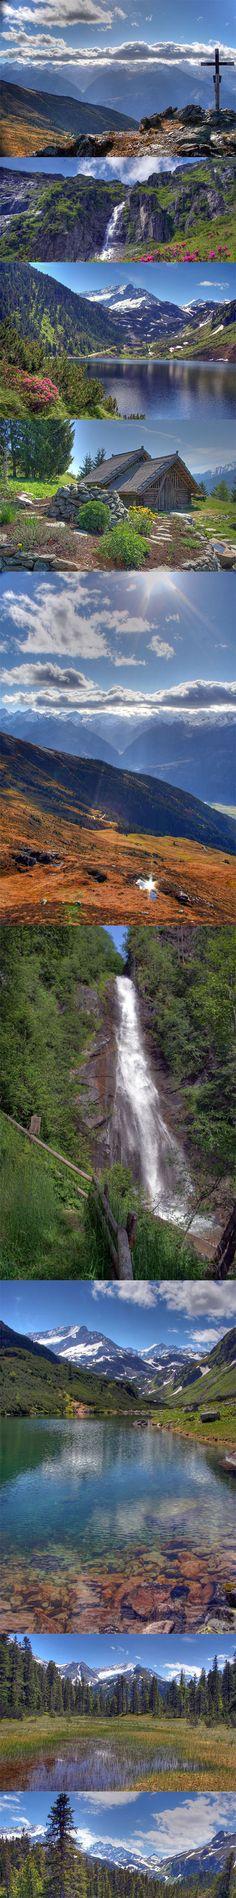 Boulderhalle im Pinzgau - Uttendorf Snowboarding, Skiing, Salzburg, Alps, Climbing, Mountains, Nature, Travel, Beautiful